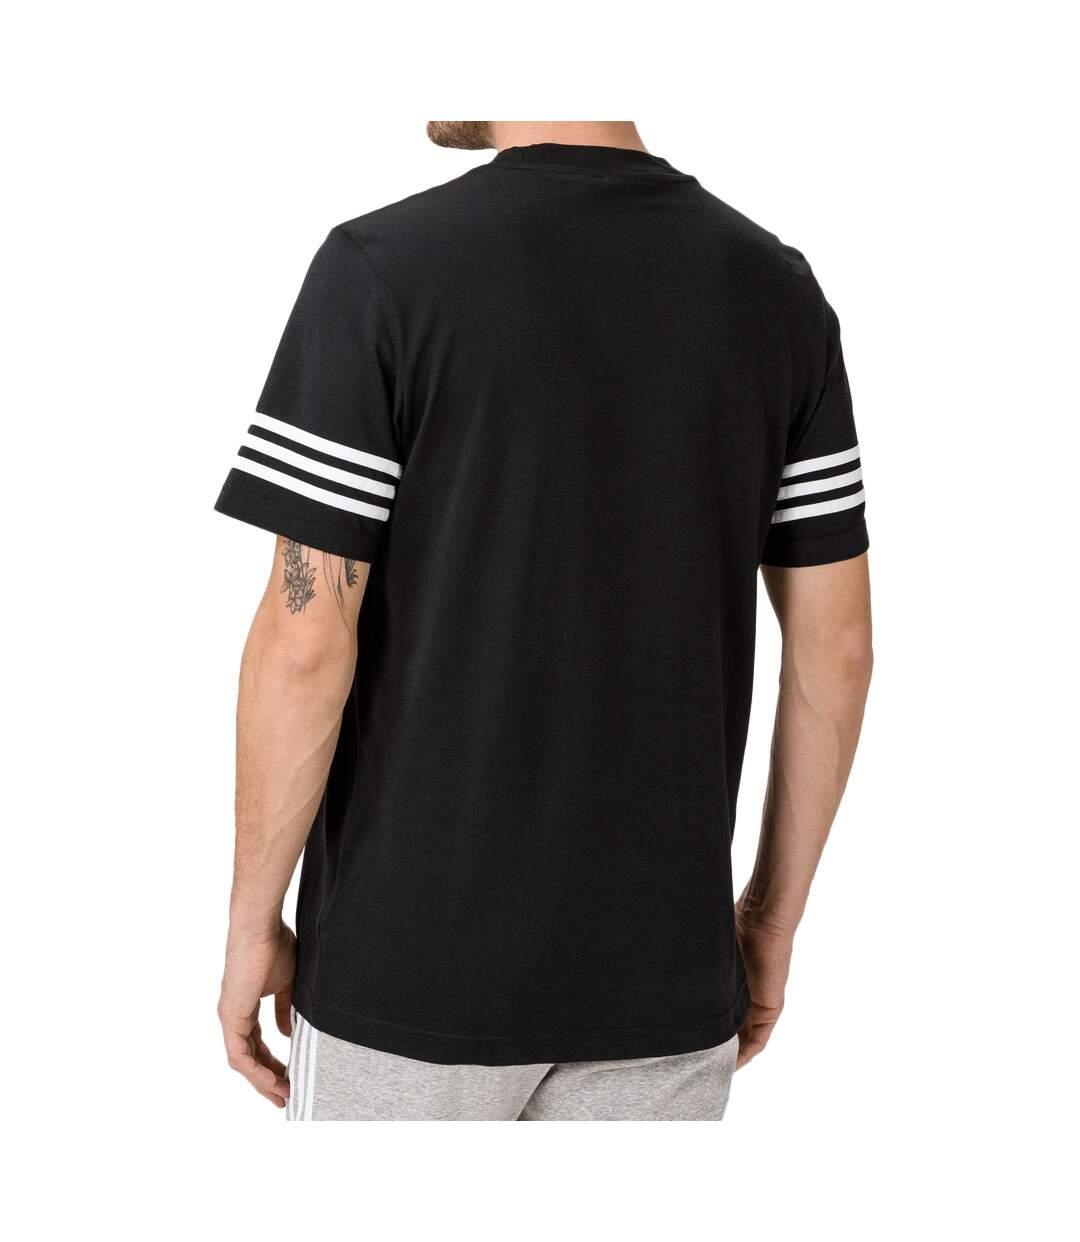 T-Shirt noir homme Adidas Outline Tee